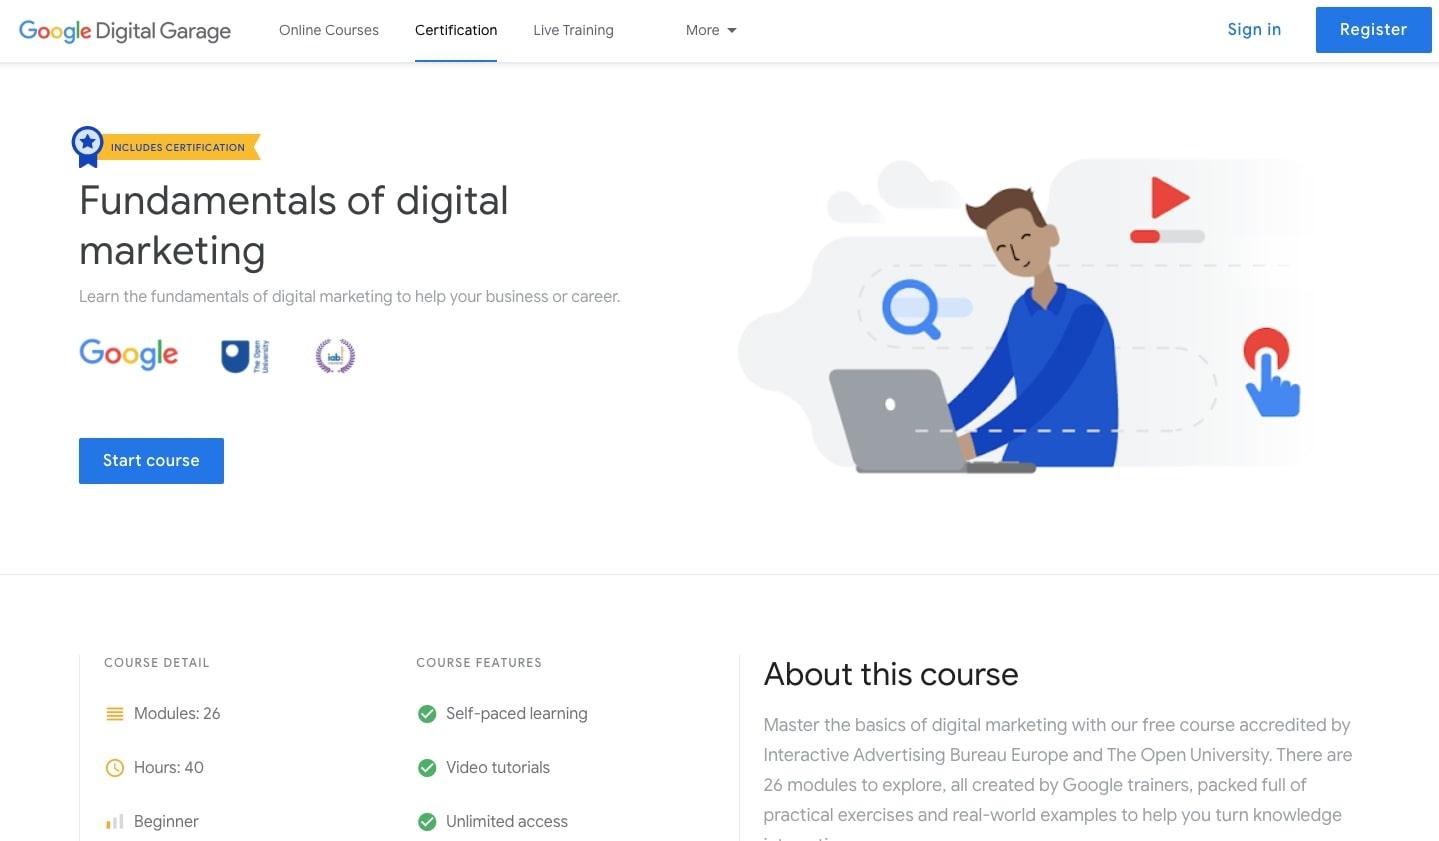 Google's fundamentals of digital marketing course